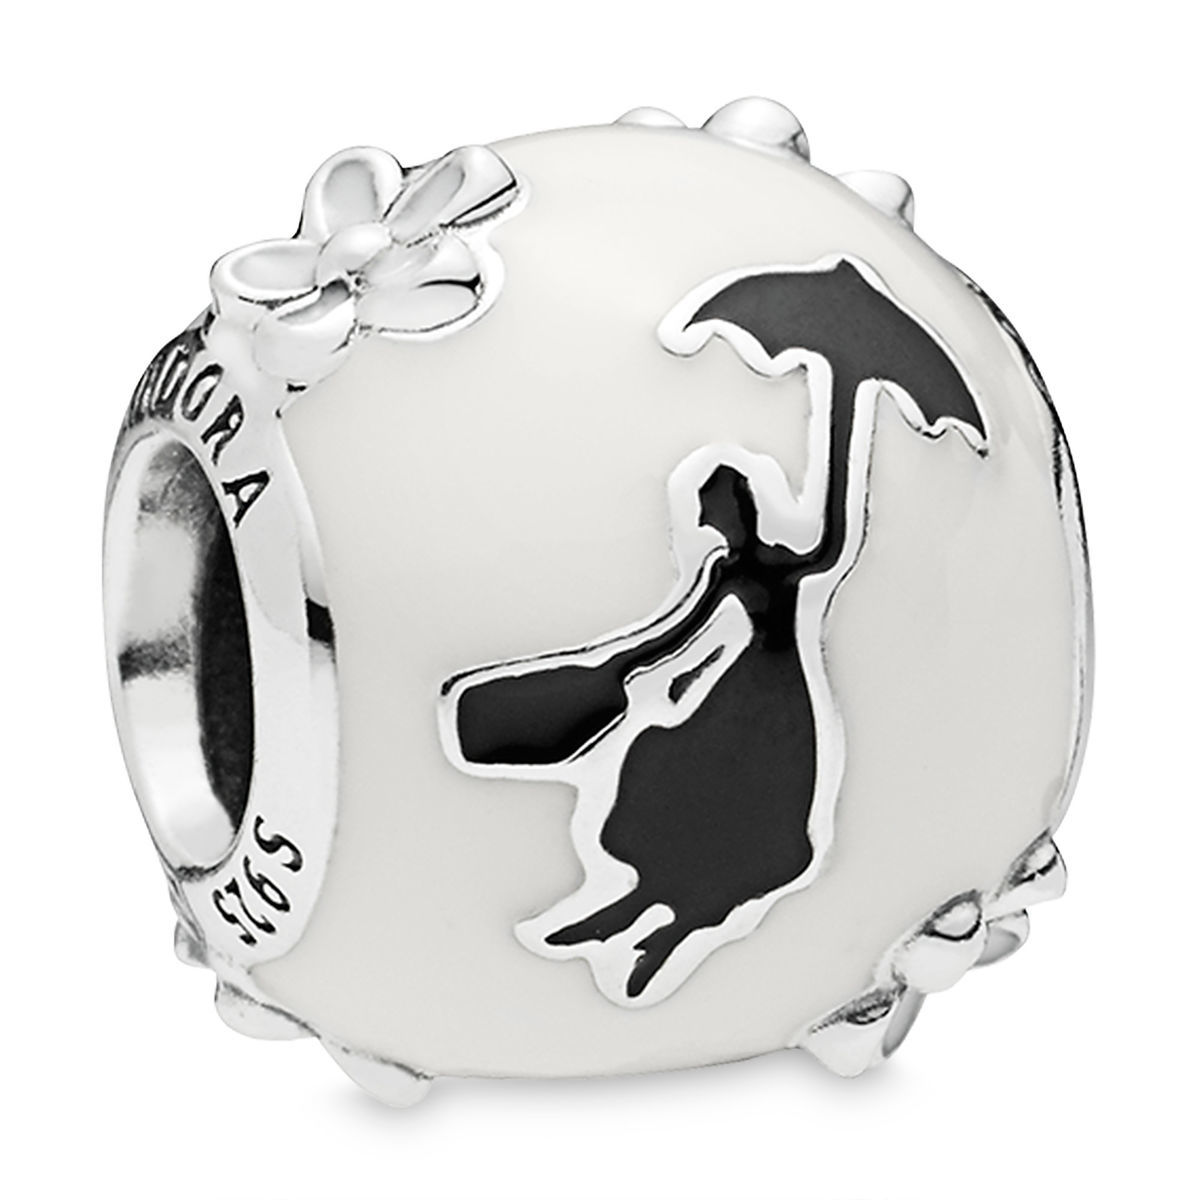 Disney PANDORA Charm - Mary Poppins Silhouette Bead